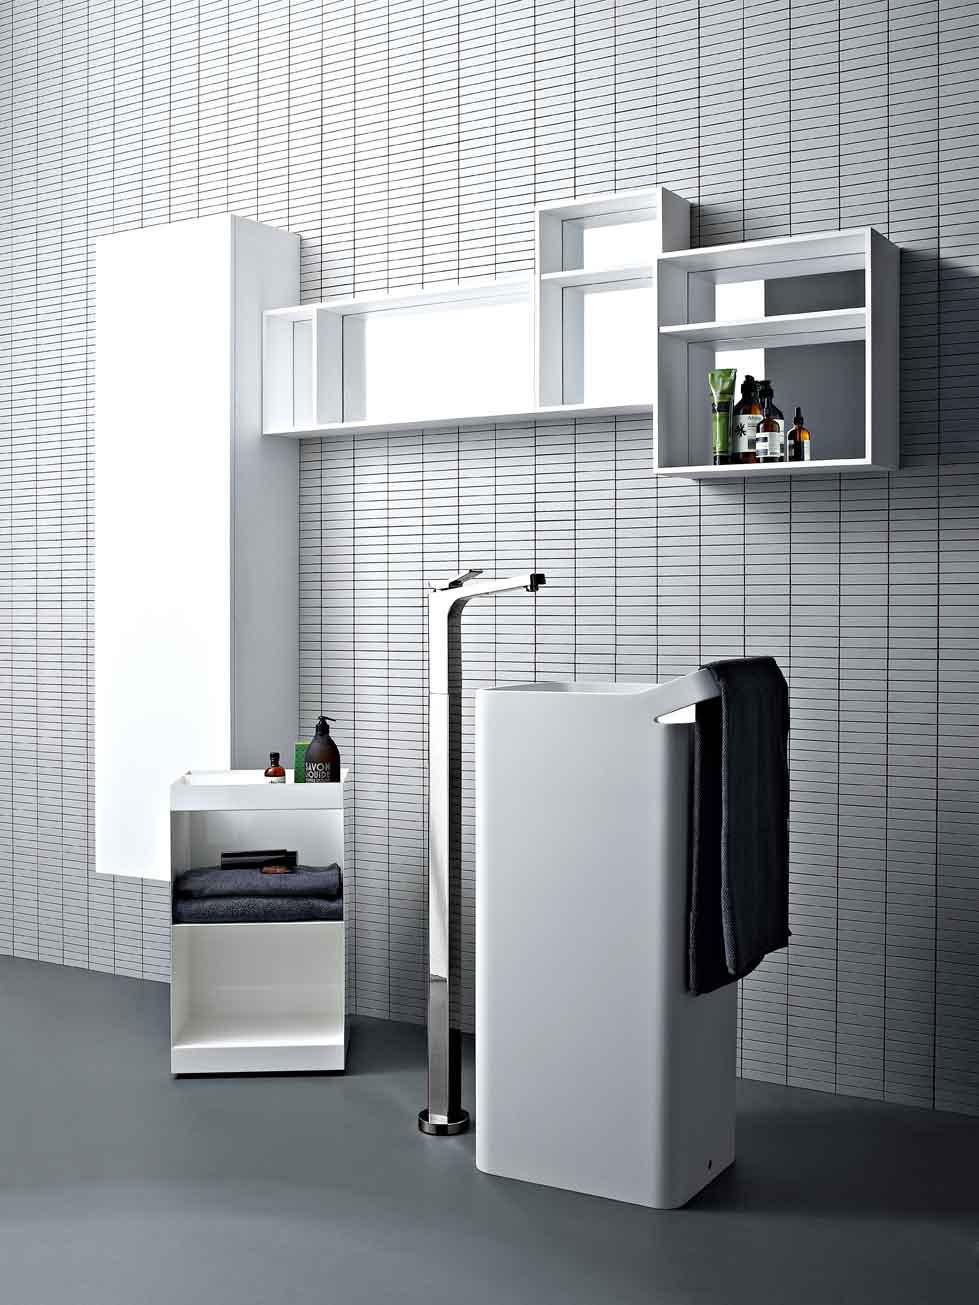 LAB 03 FREE STANDING - Mobili lavabo Kos  Architonic